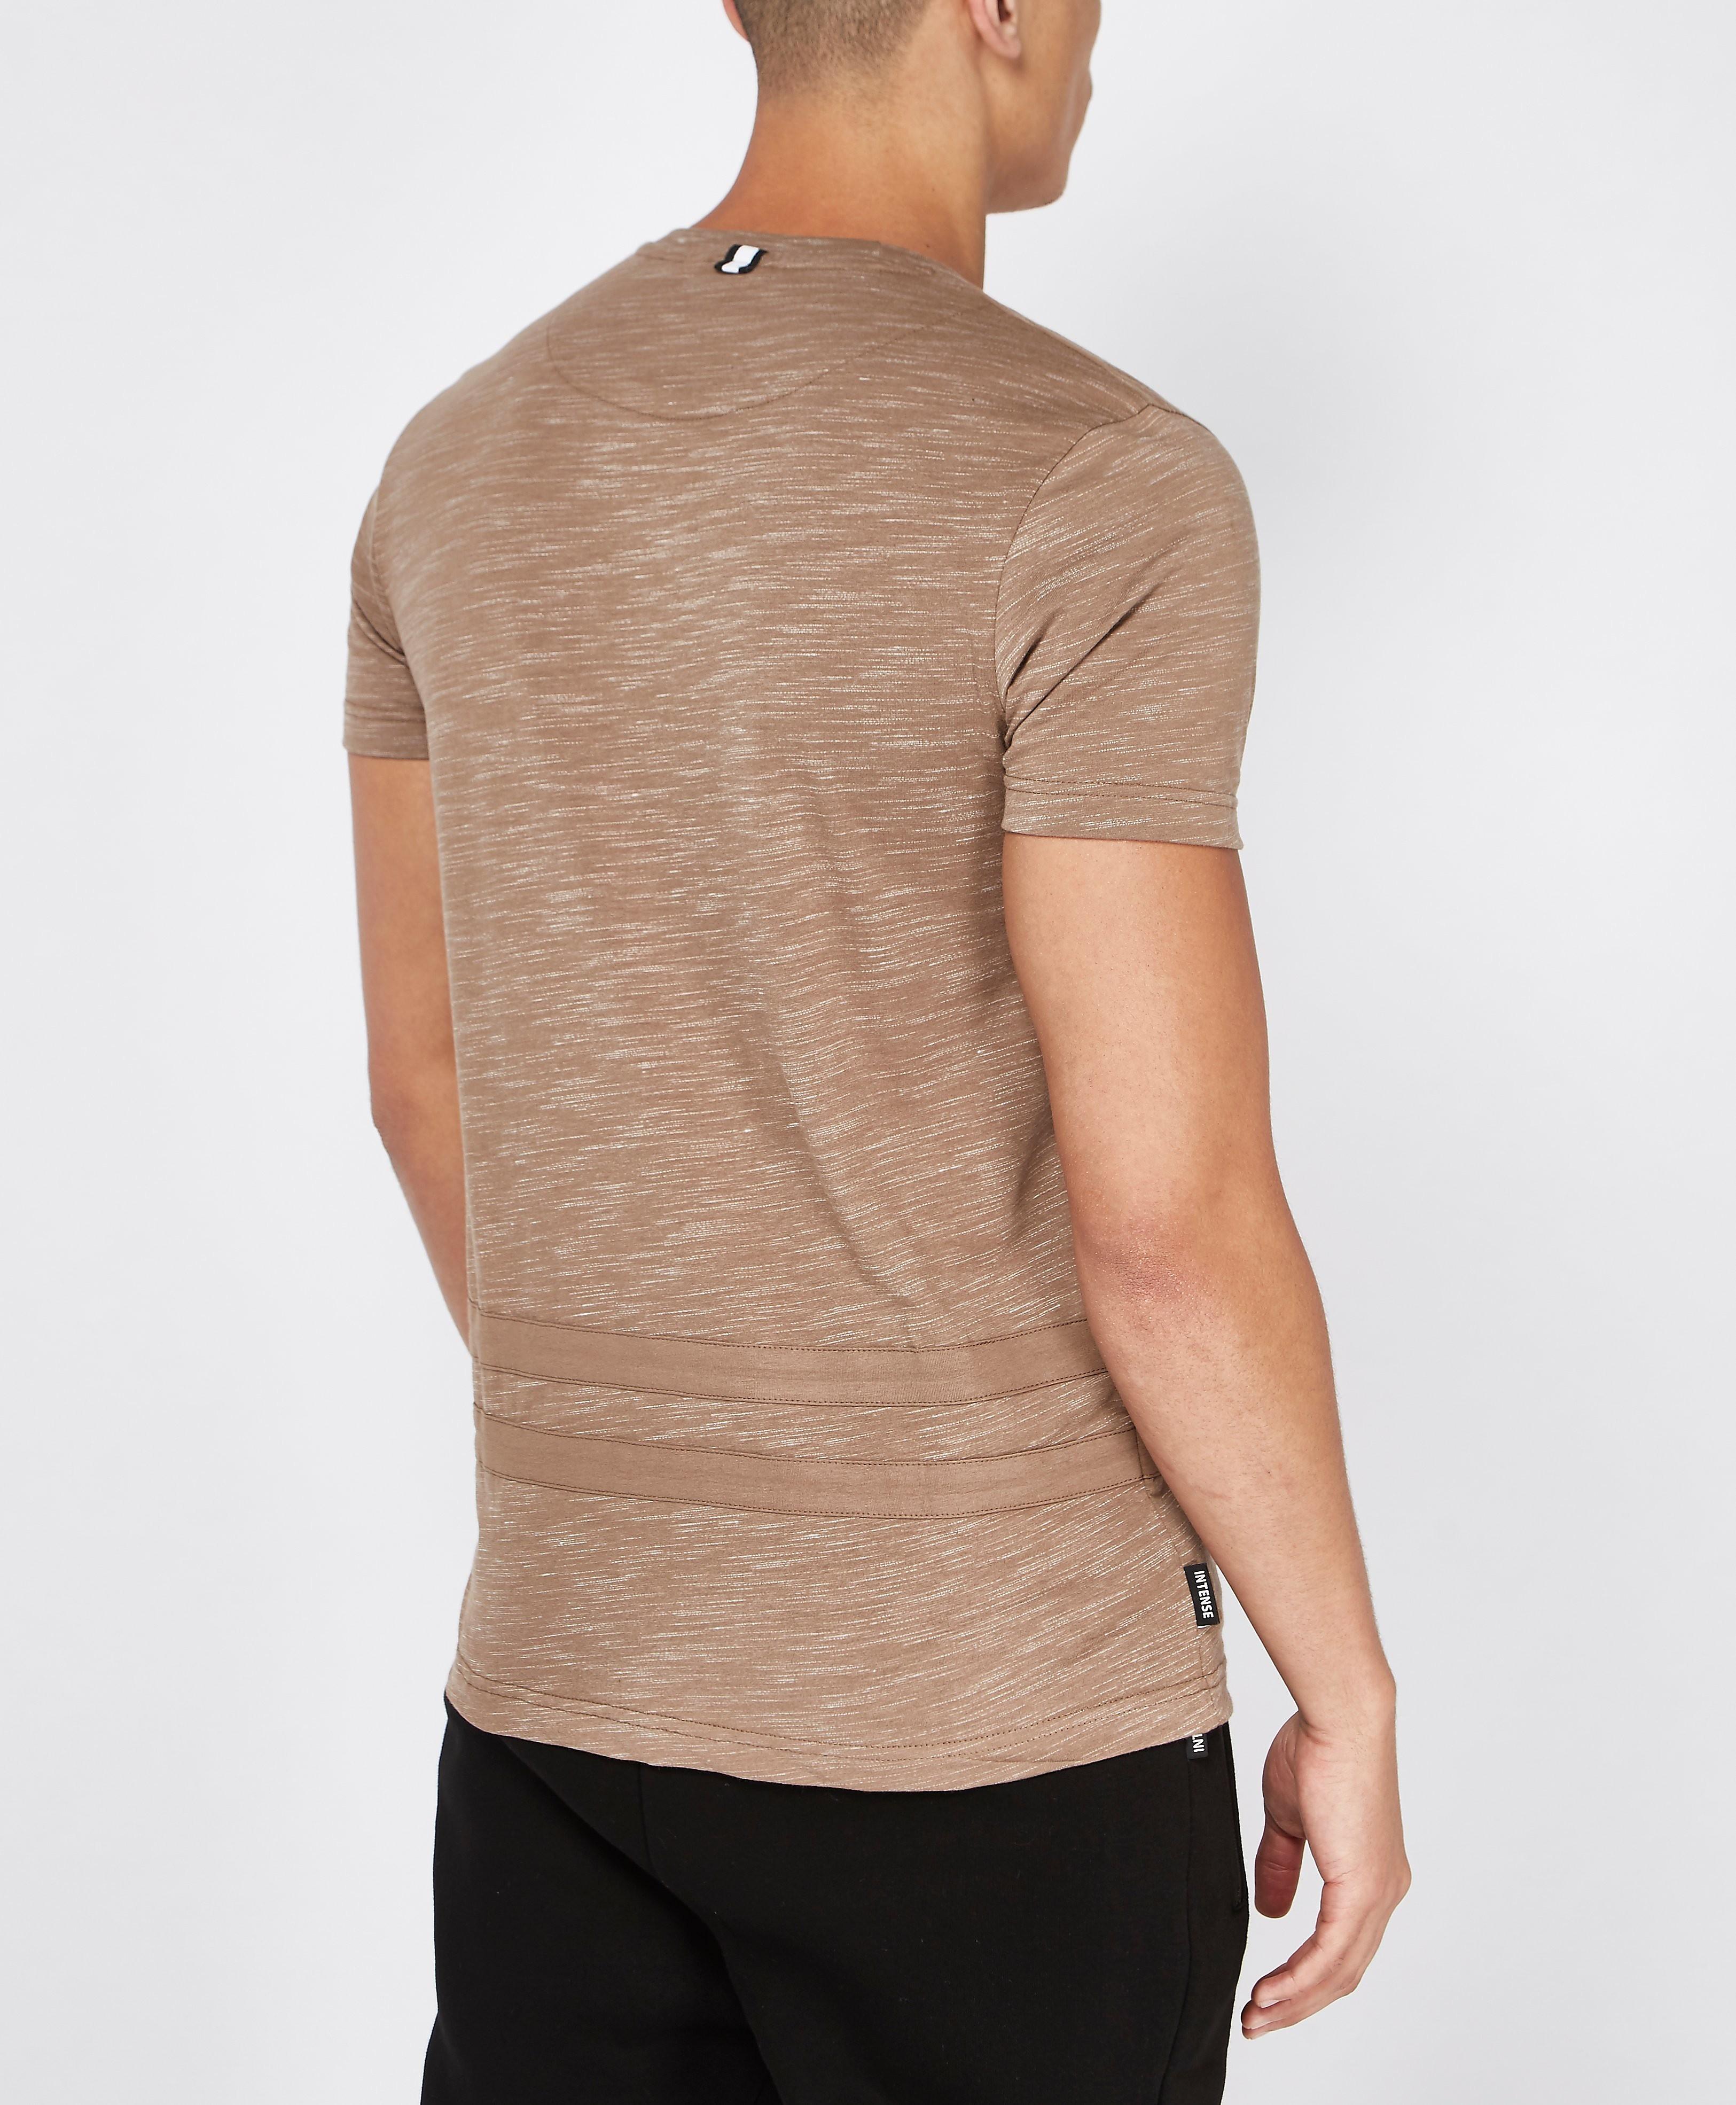 Intense Clothing Sicana Short Sleeve T-Shirt